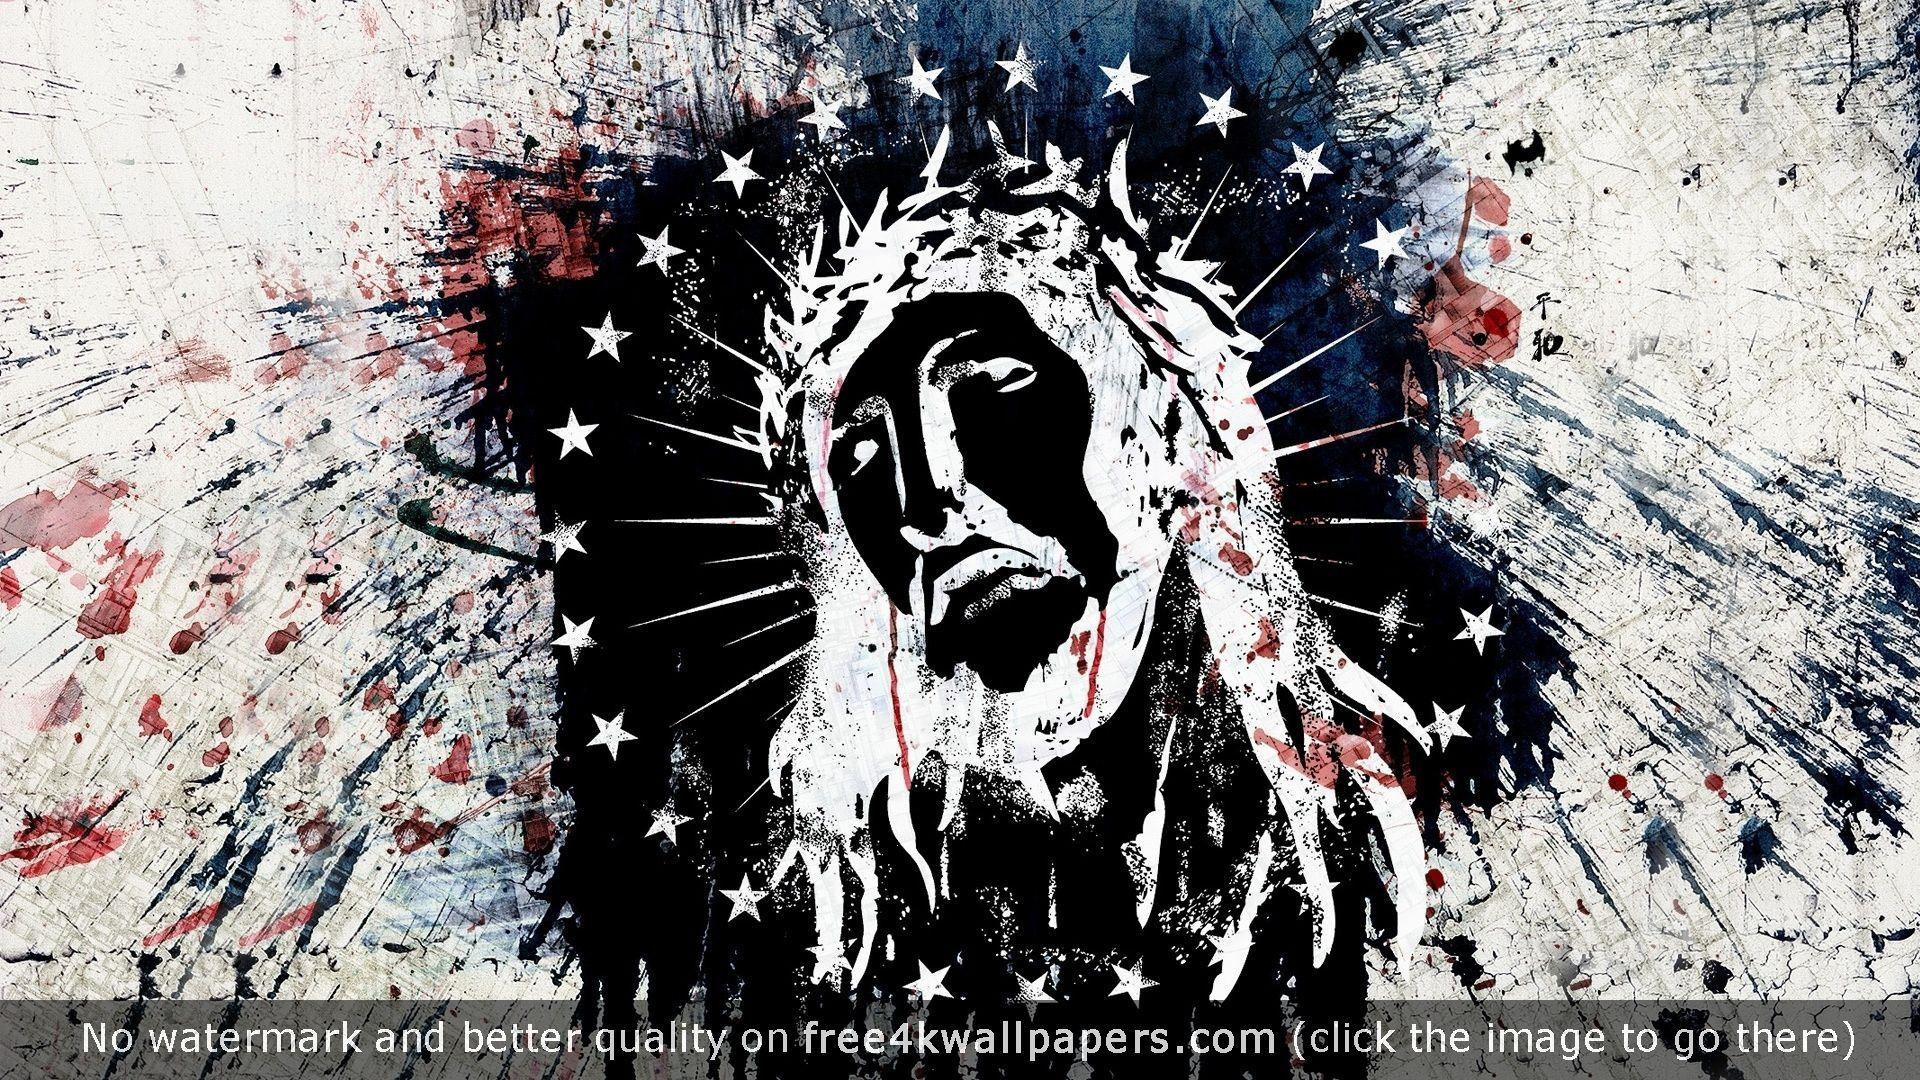 Jesus Christ Hd HD wallpaper 1920x1080